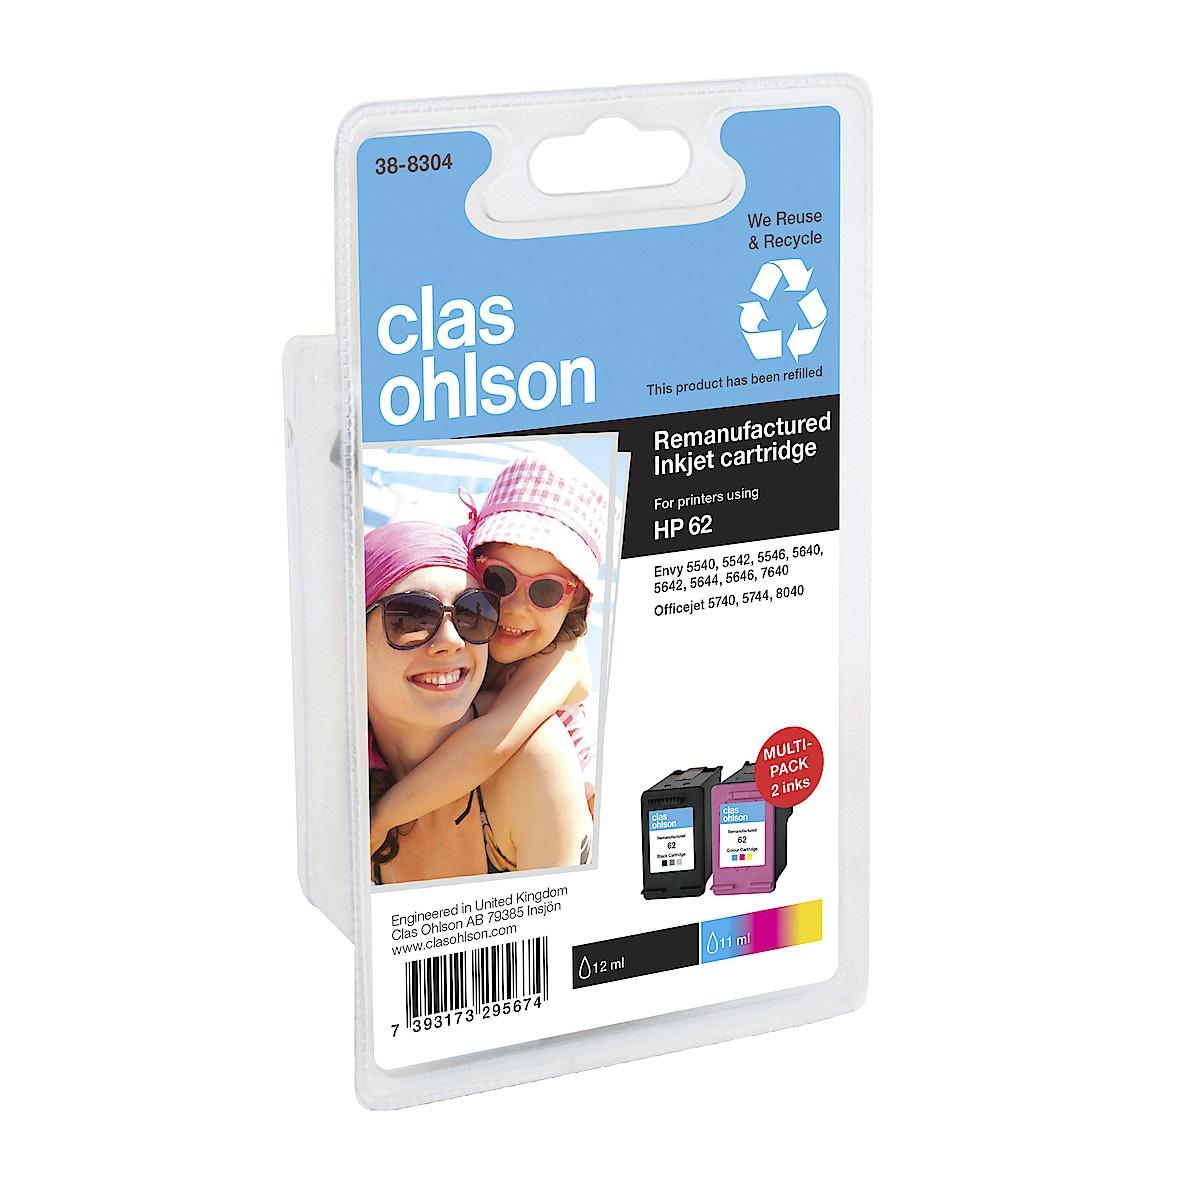 Clas Ohlson HP 62 Ink Cartridge